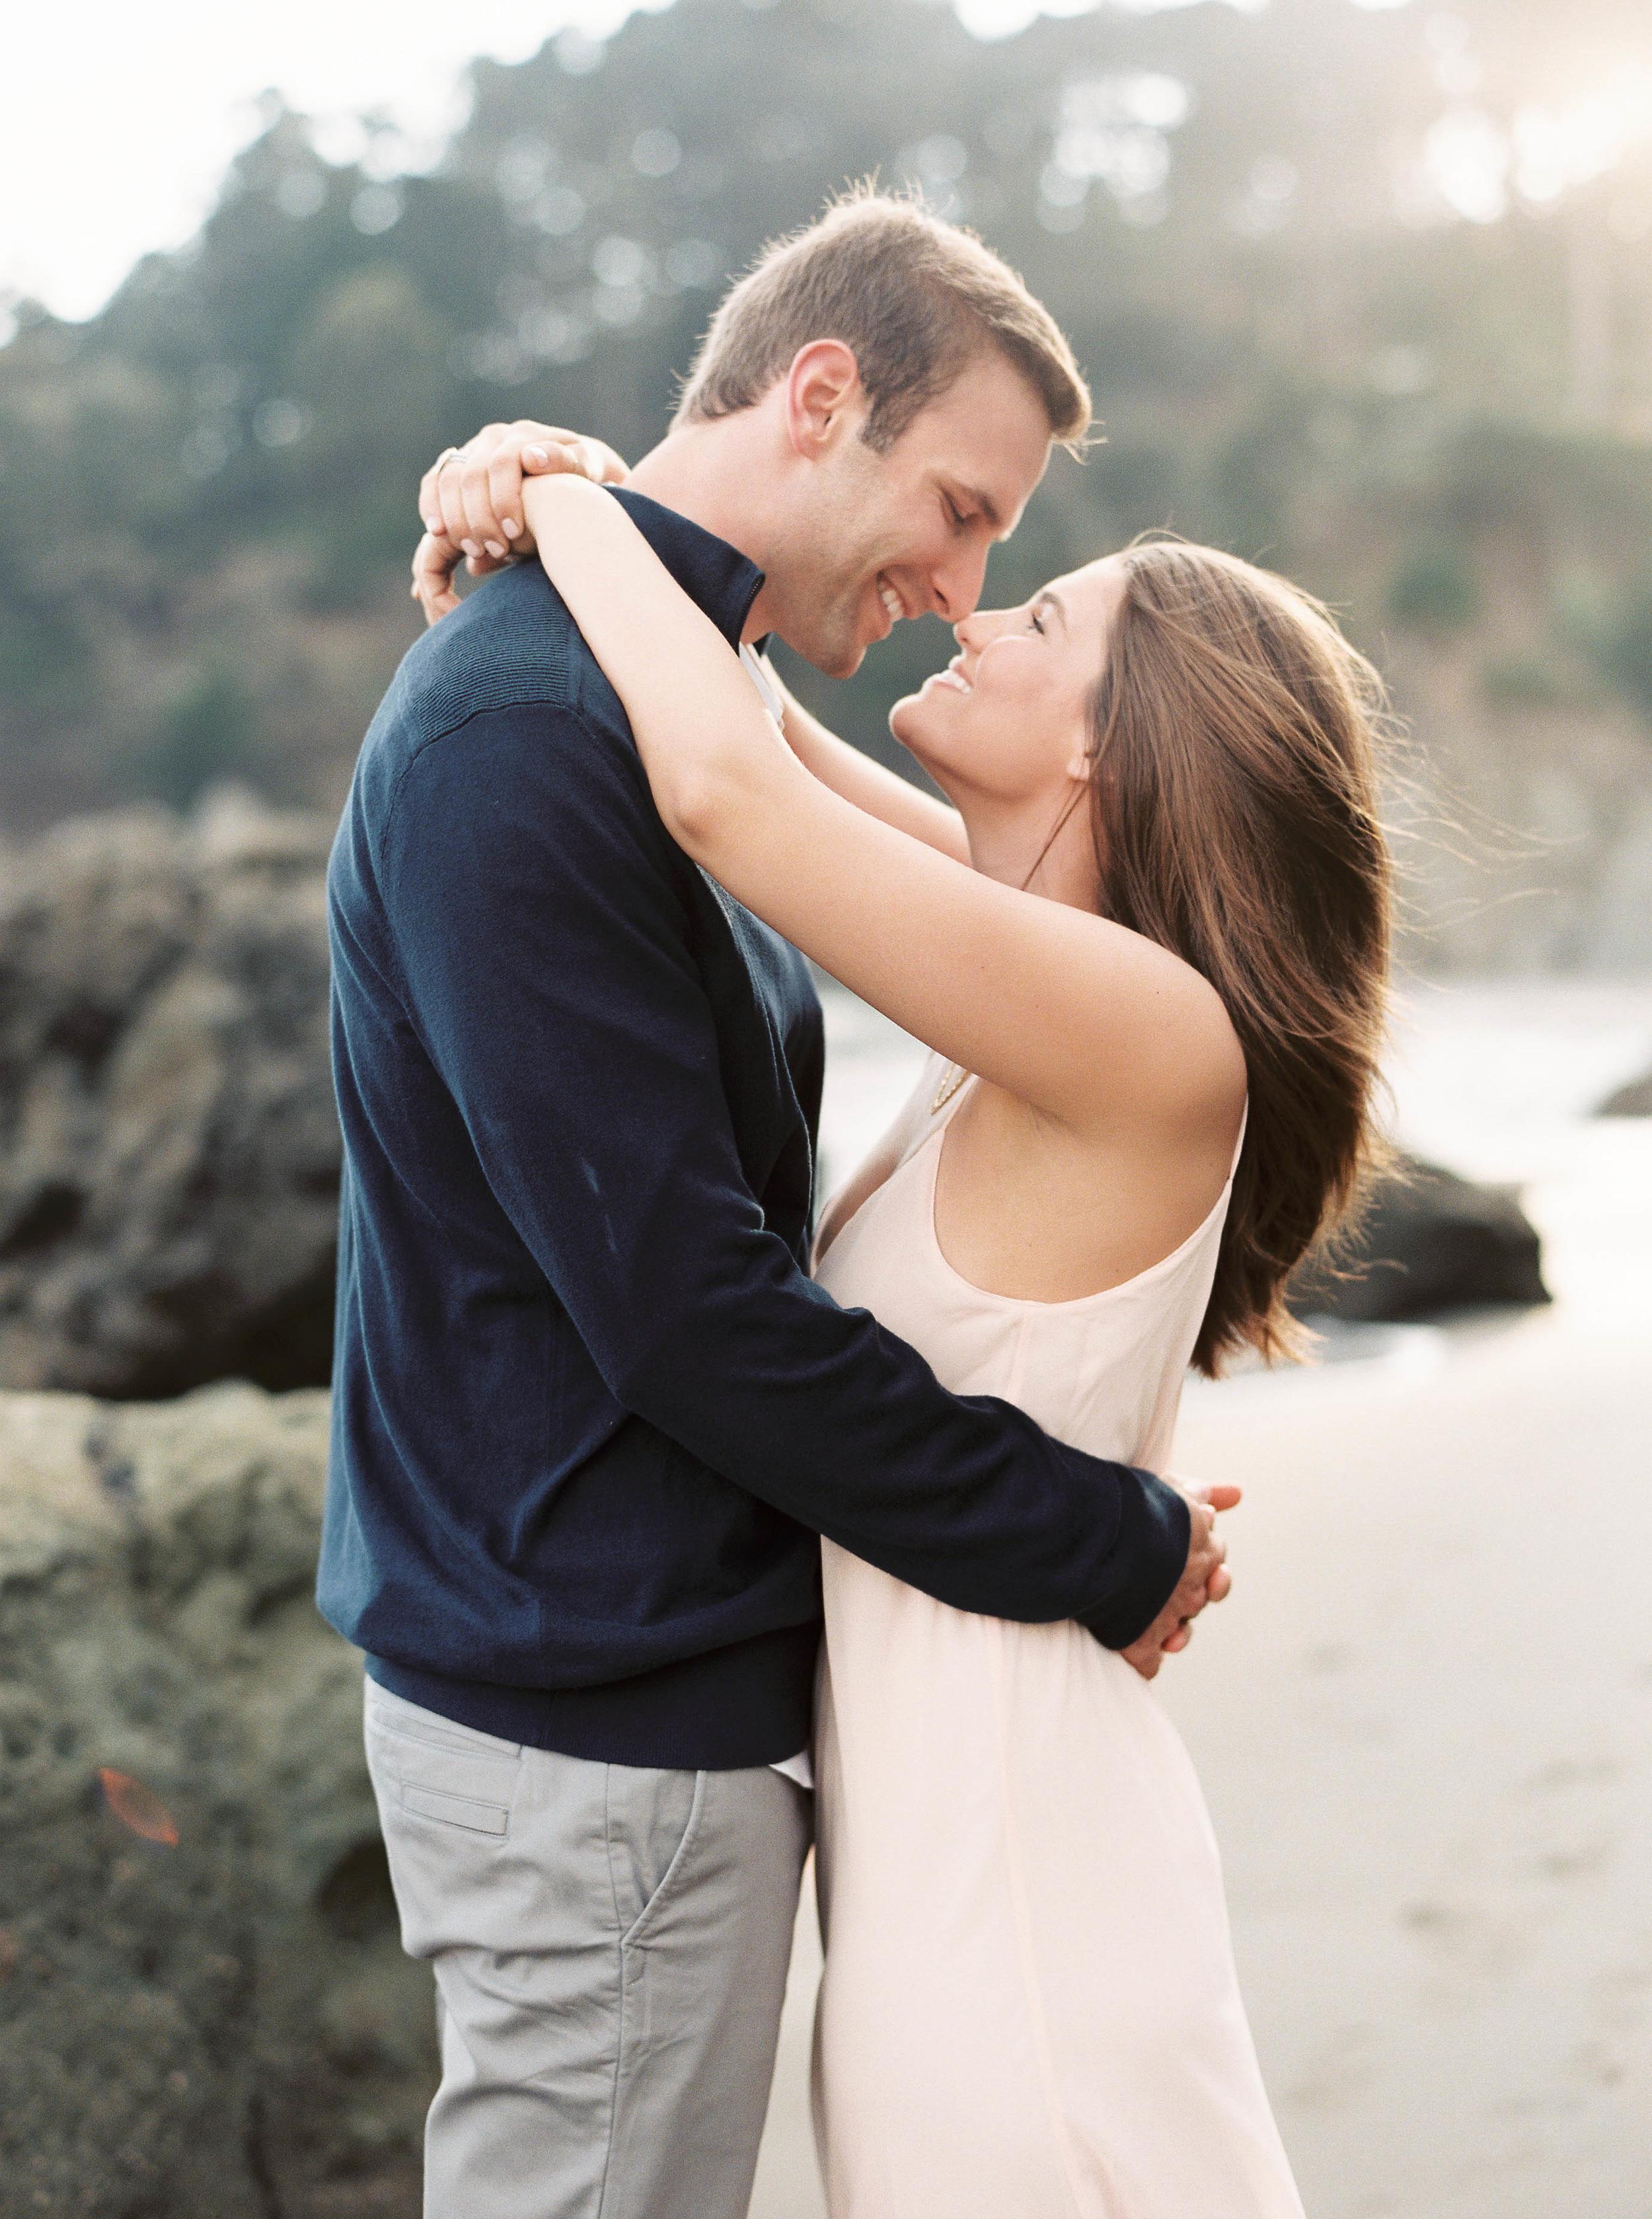 Meghan Mehan Photography - Fine Art Film Wedding Photography - San Francisco | Napa | Sonoma | Big Sur | Santa Barbara - 073.jpg